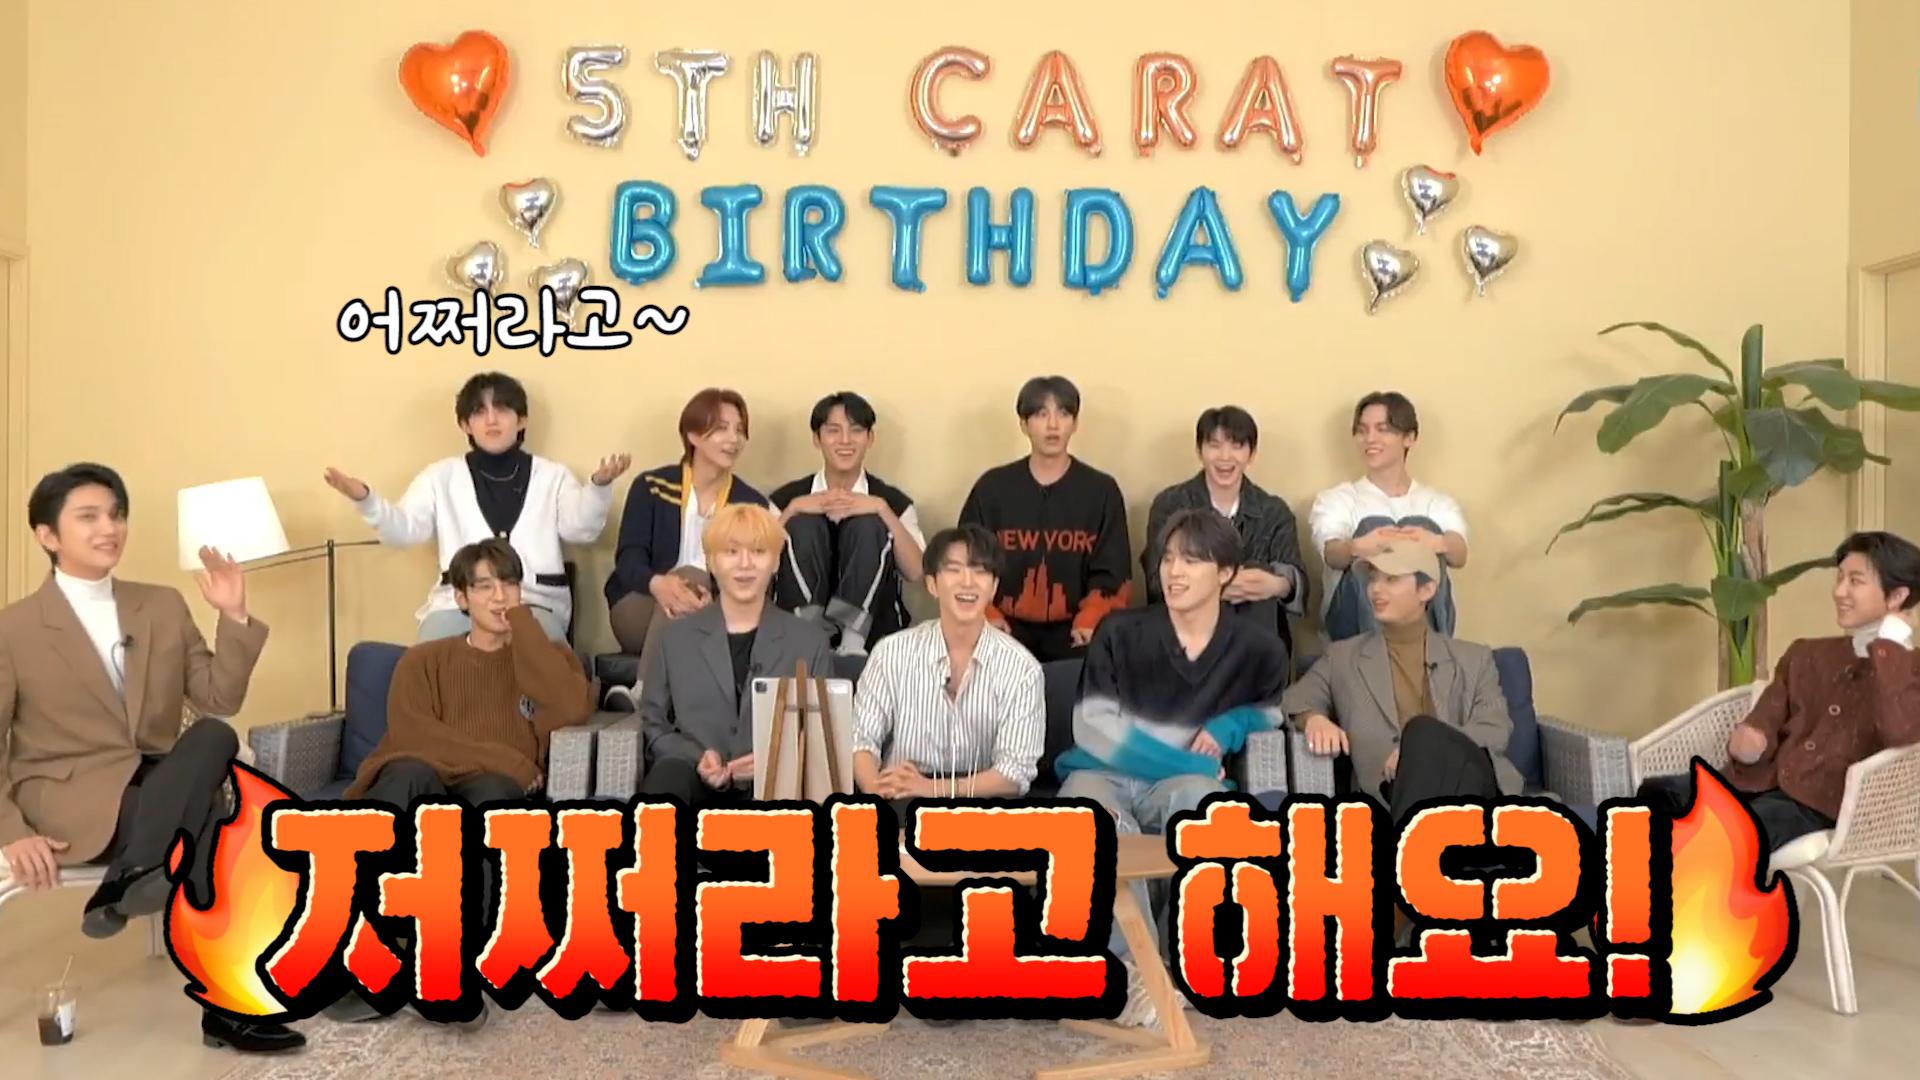 [SEVENTEEN] 캐럿 생일인데 어쩌라고 저쩌라고 무지개반사~🌈 (CARAT's 5years anniversary!)